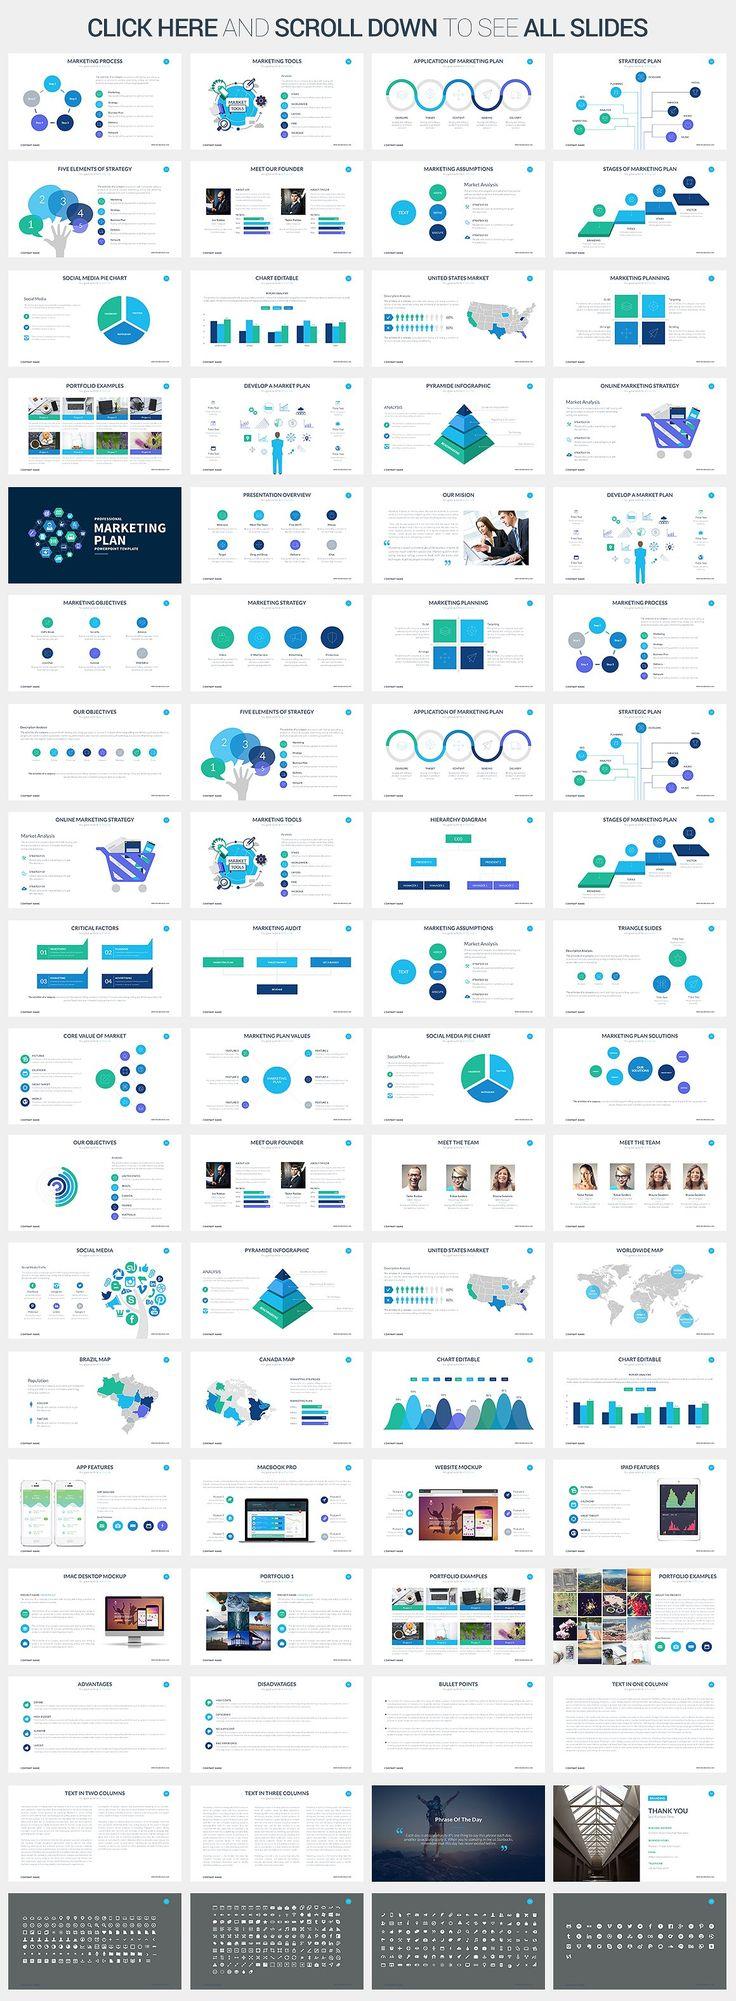 Marketing Plan - Keynote Template by SlidePro on @creativemarket